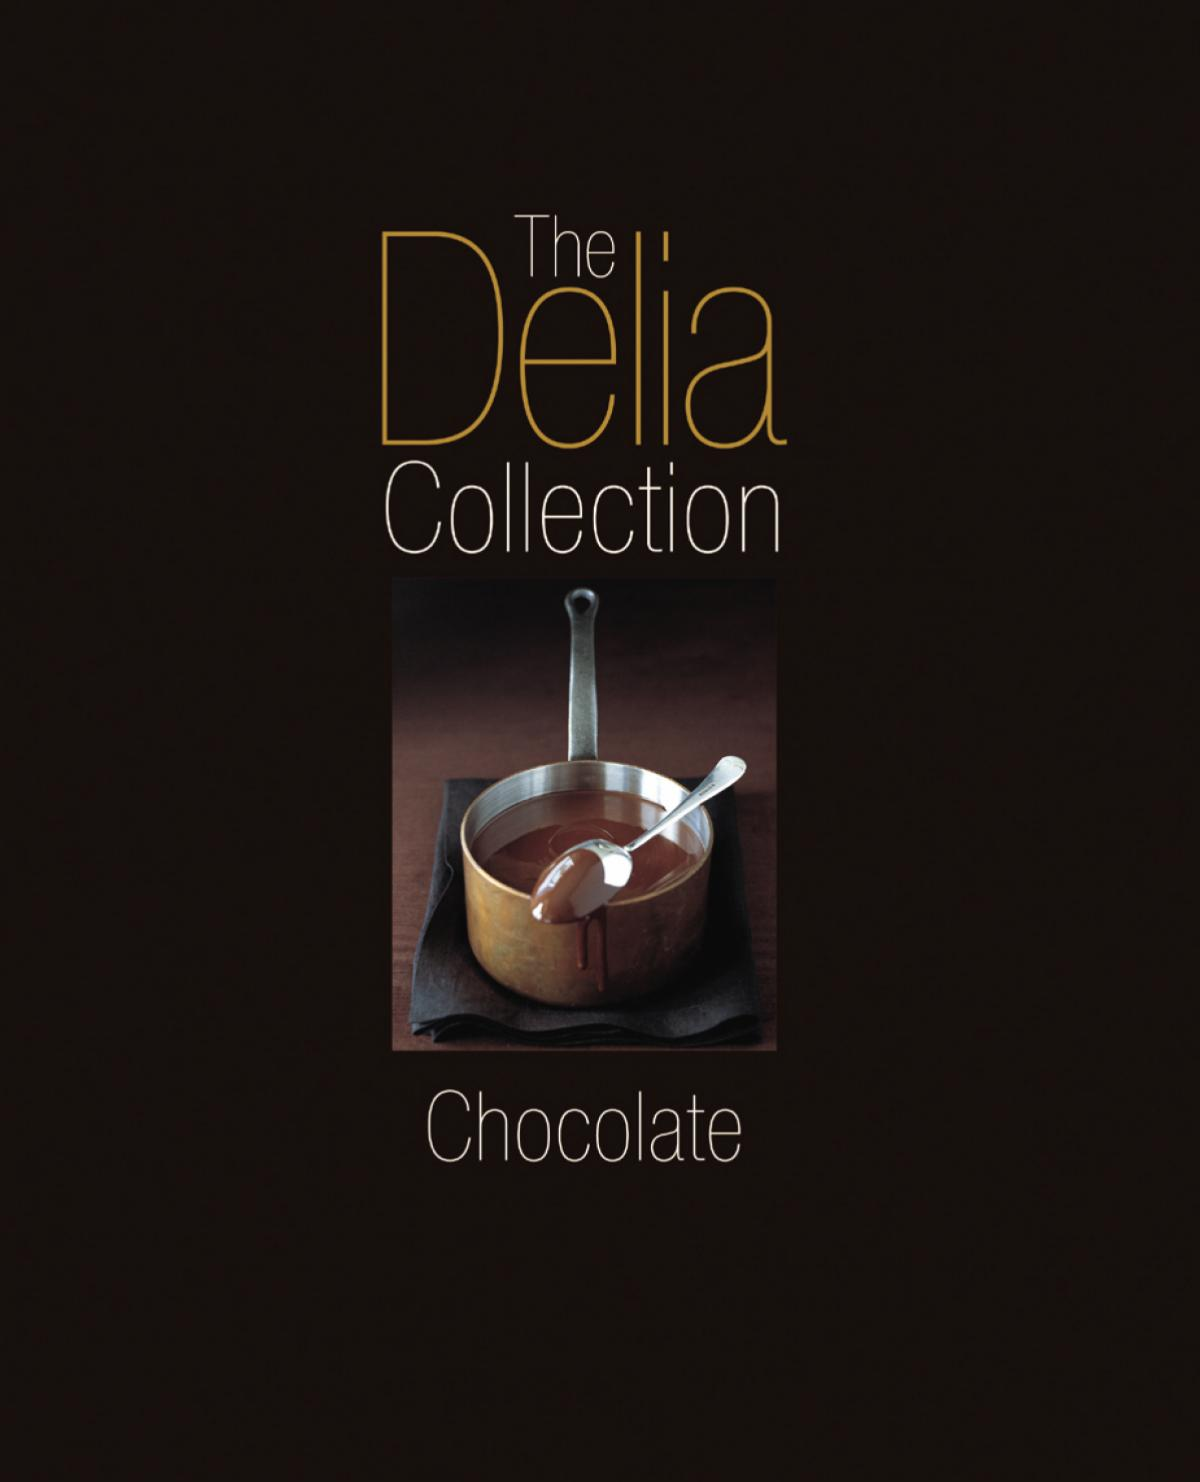 A picture of Delia's The Delia Collection: Chocolate recipes